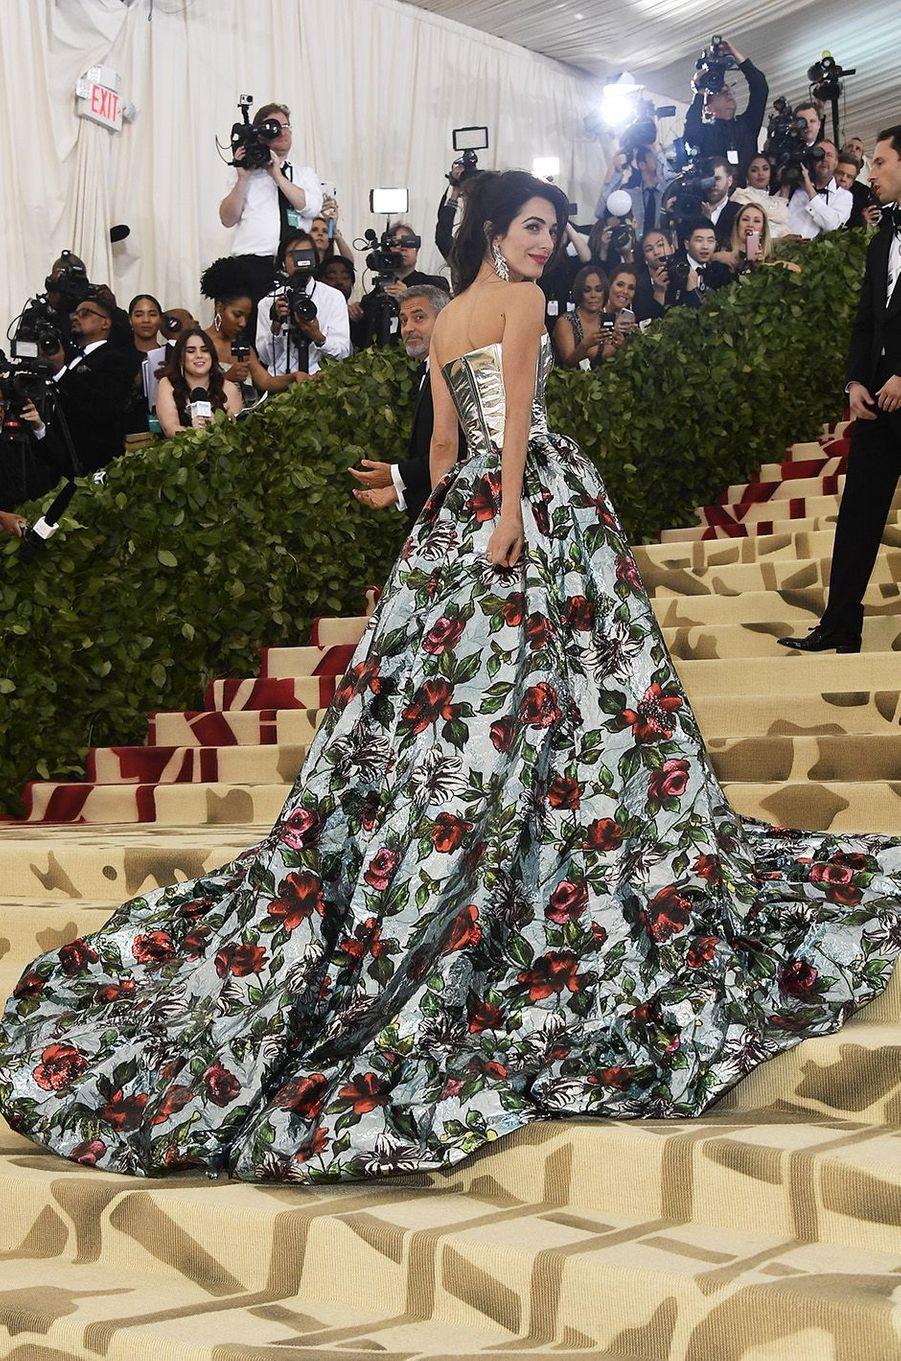 Amal Clooneyau Met Gala 2018, à New York le 7 mai 2018.